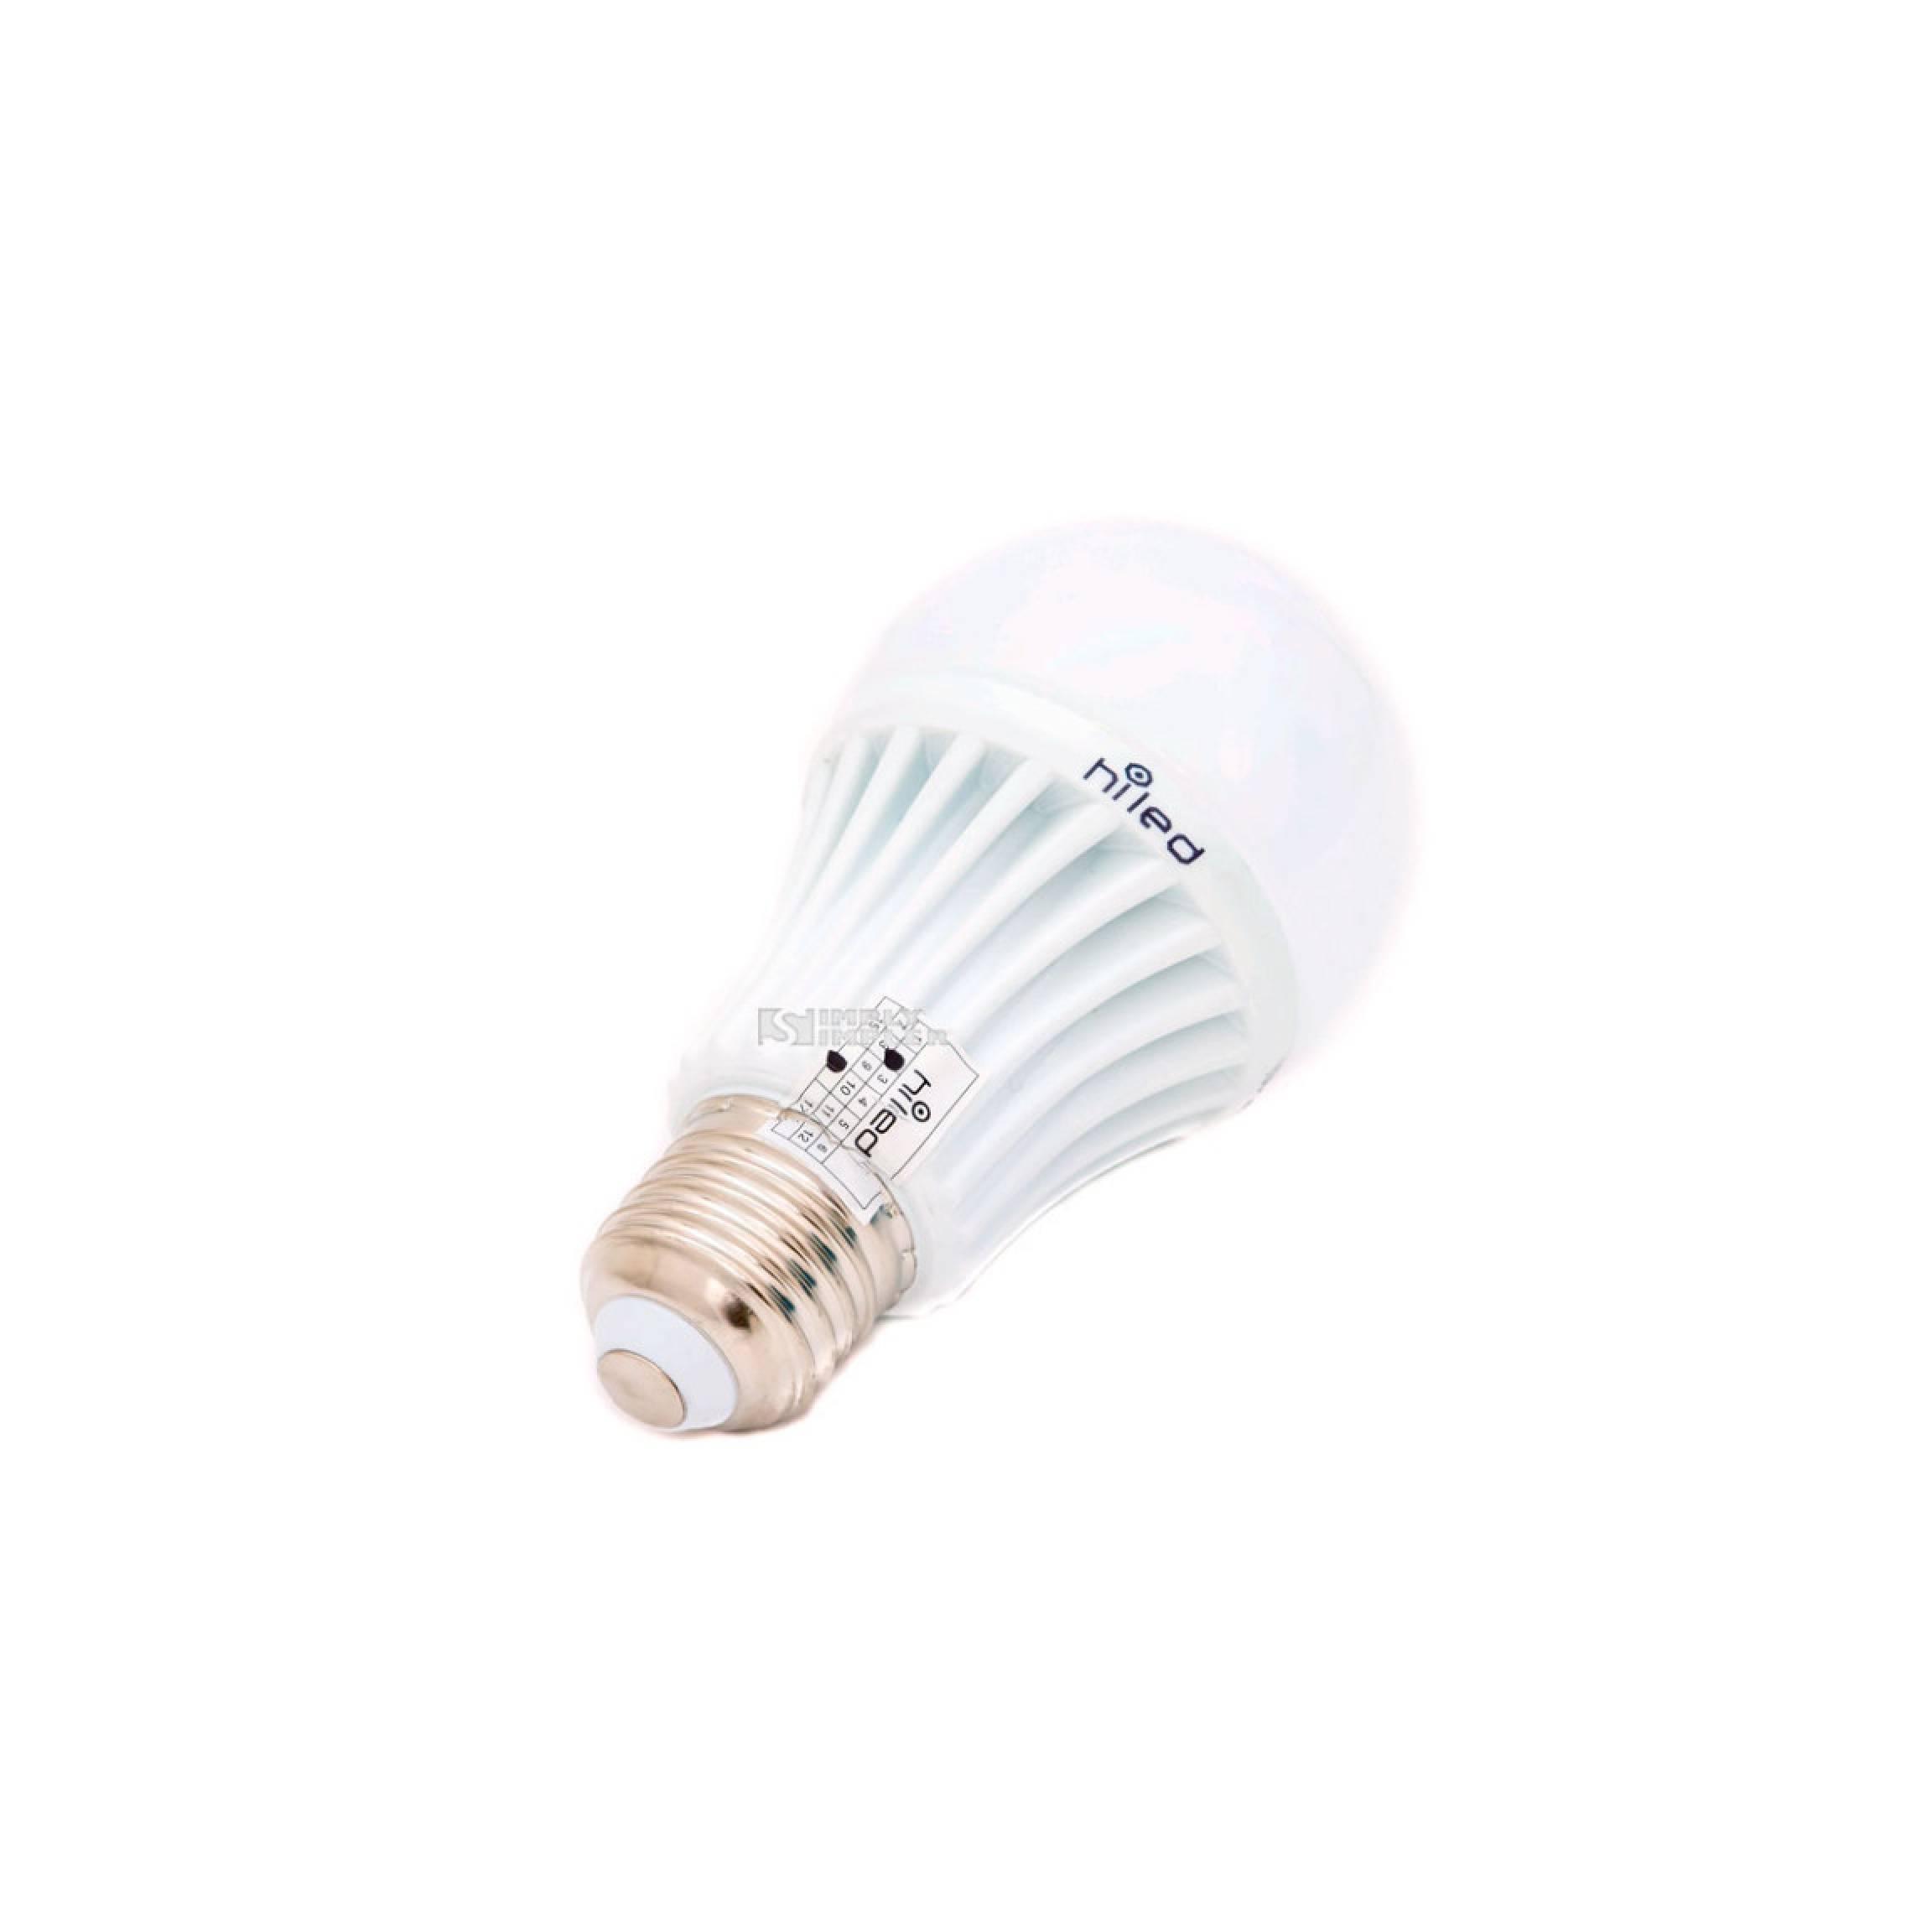 Hiled Bohlam Led Bulb 220v 5w White Non Dimmable Garansi 24 Bulan Lampu .